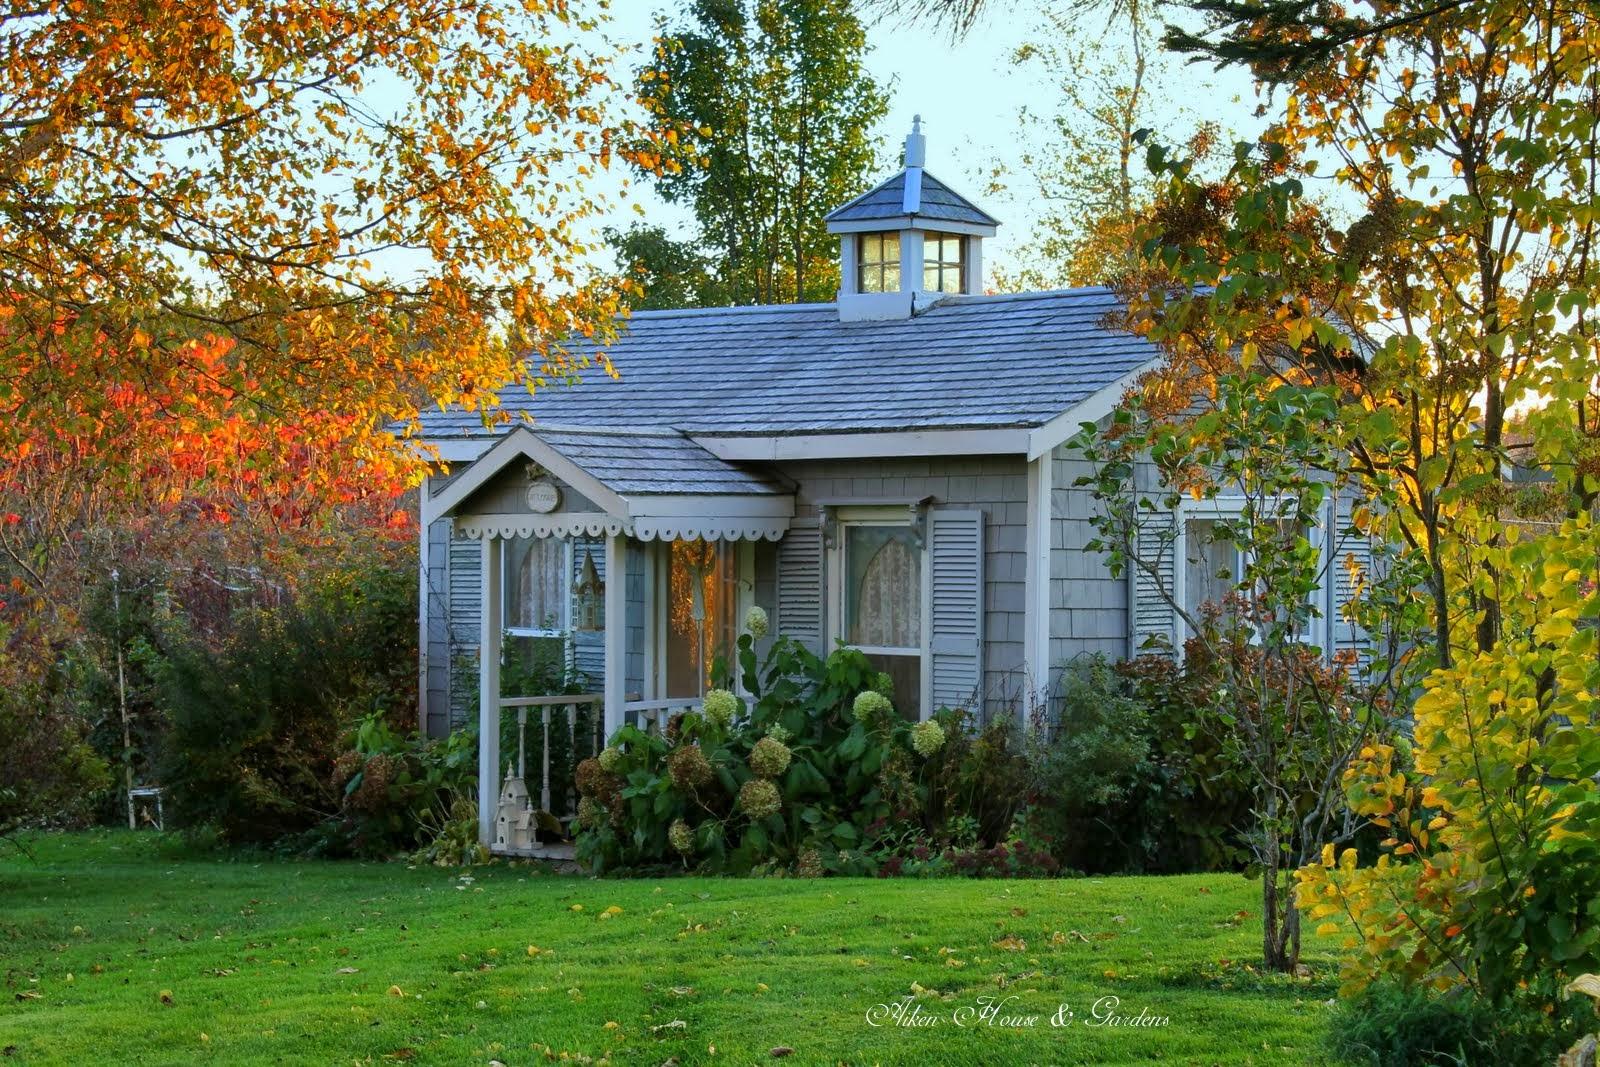 Prince edward island on pinterest house gardens for Aiken house